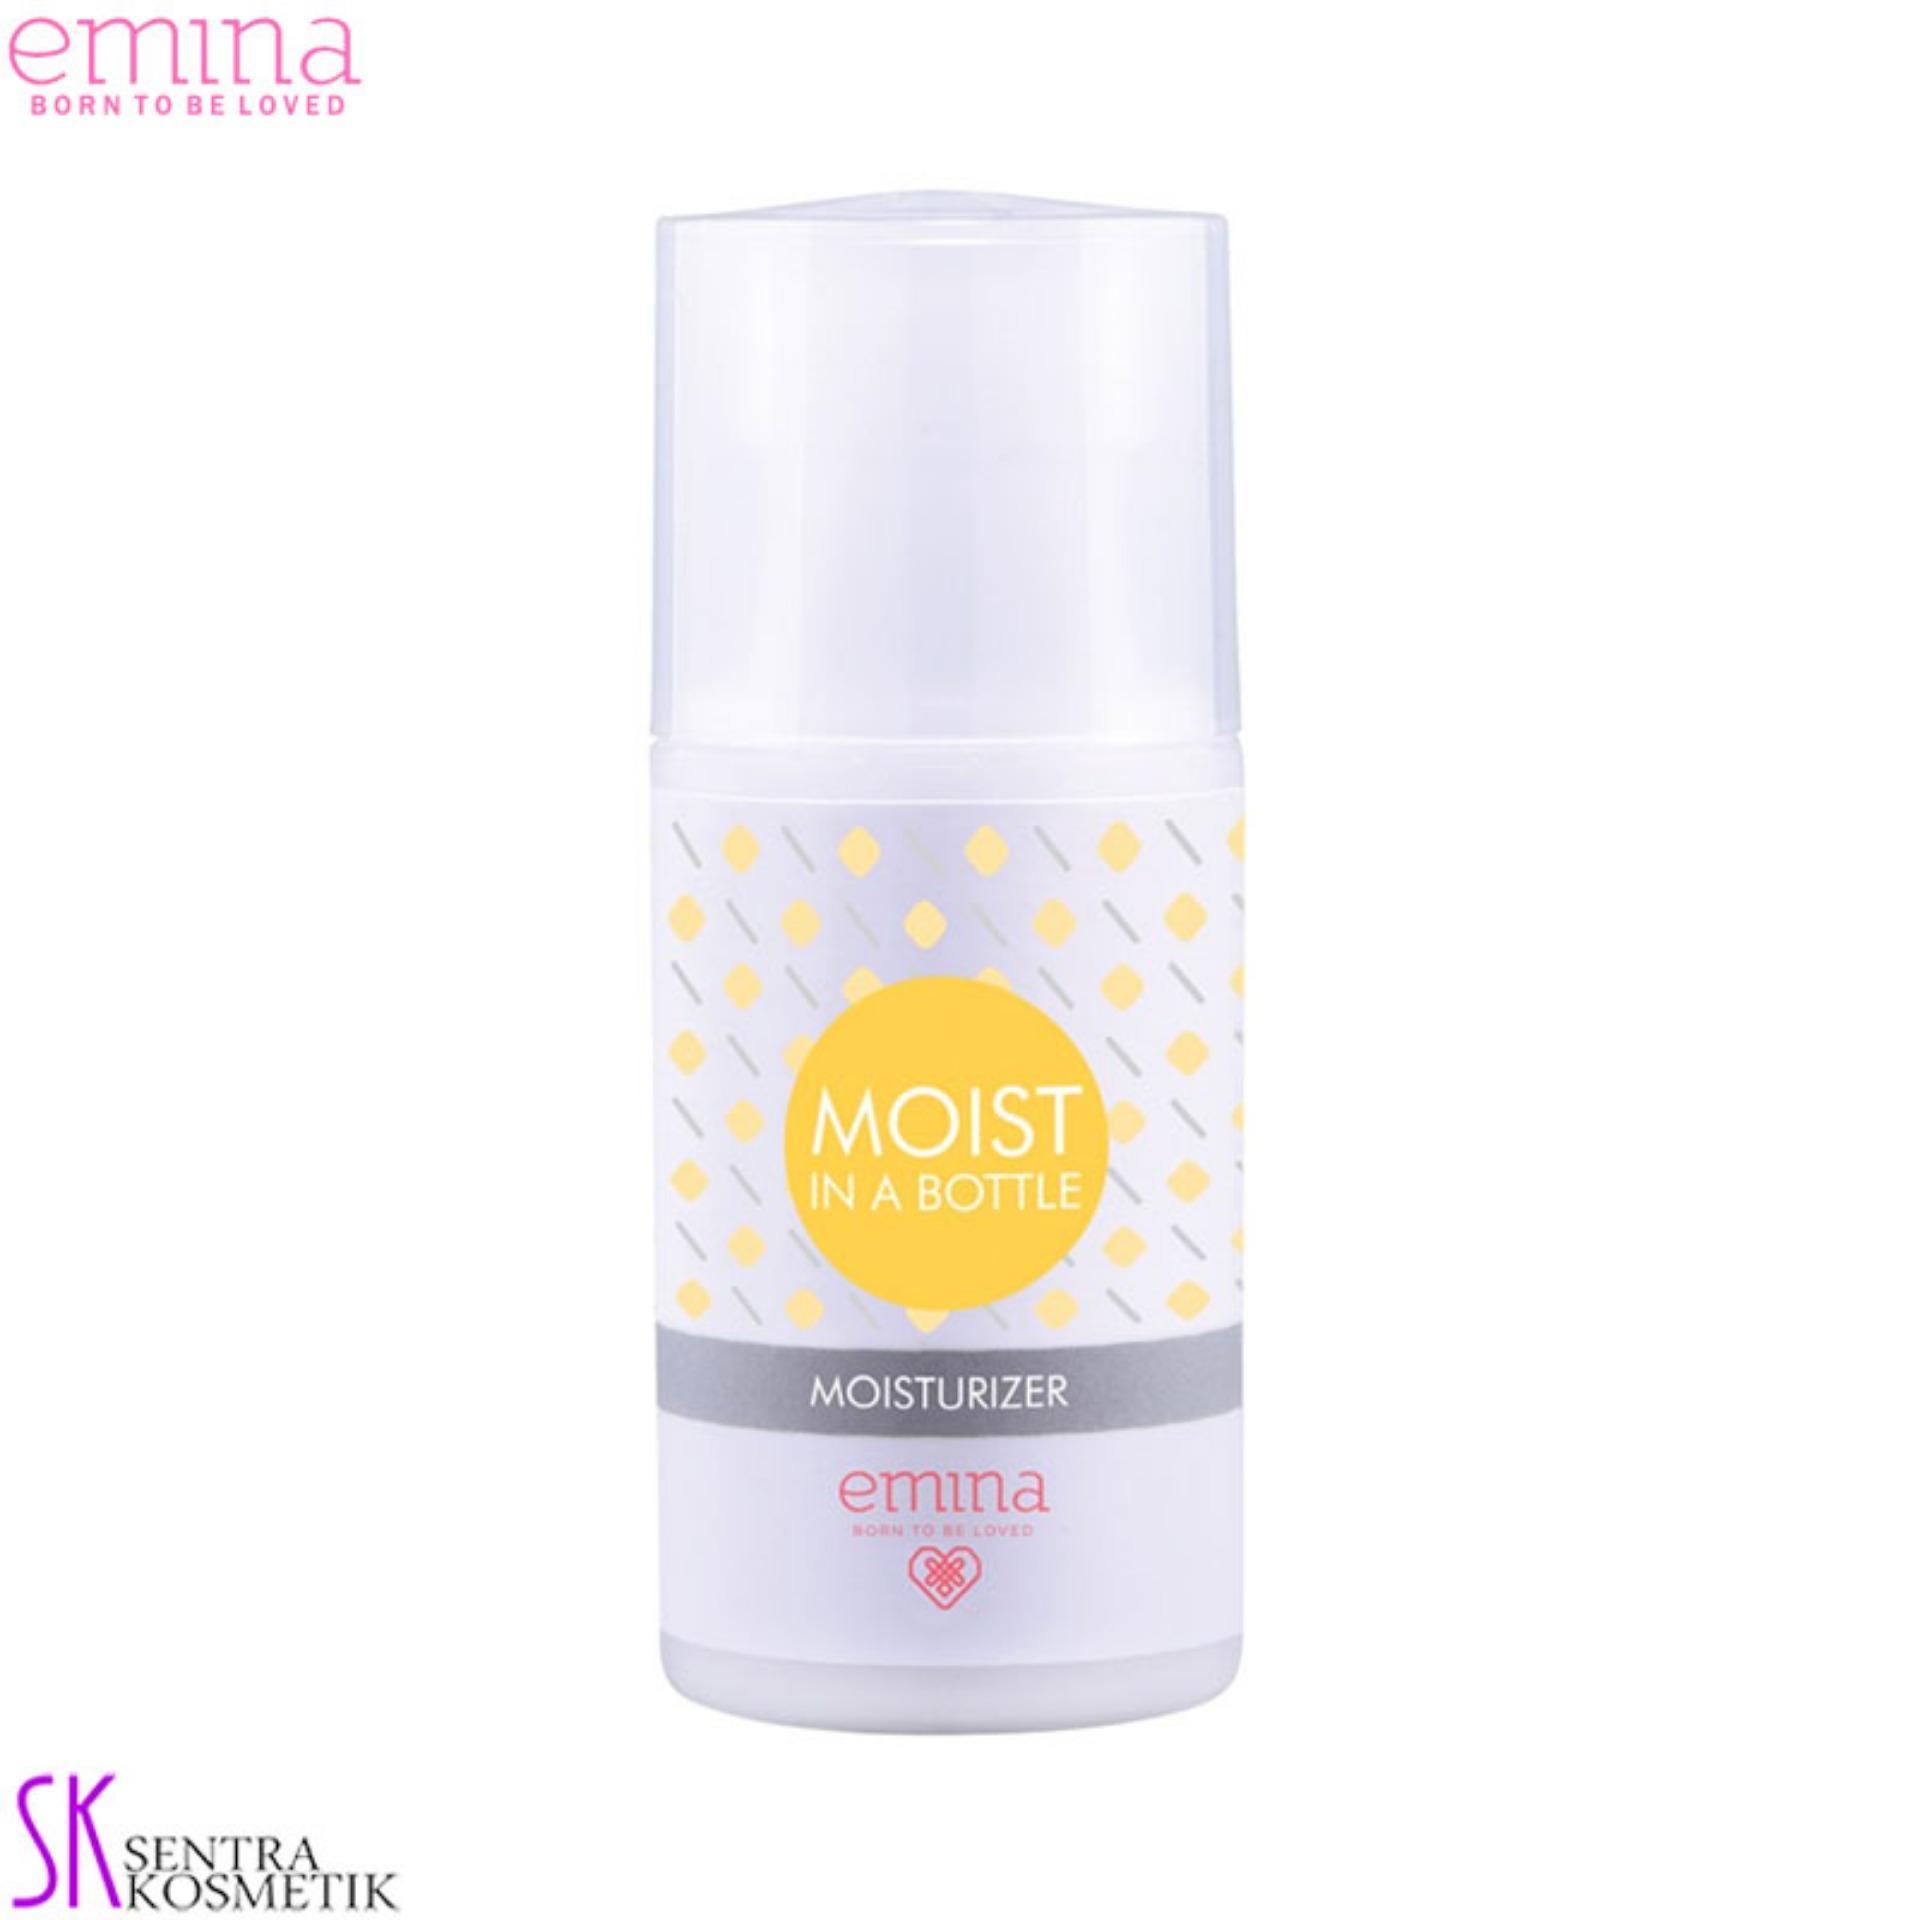 Emina Moisturizer Moist In A Bottle - 50 ml